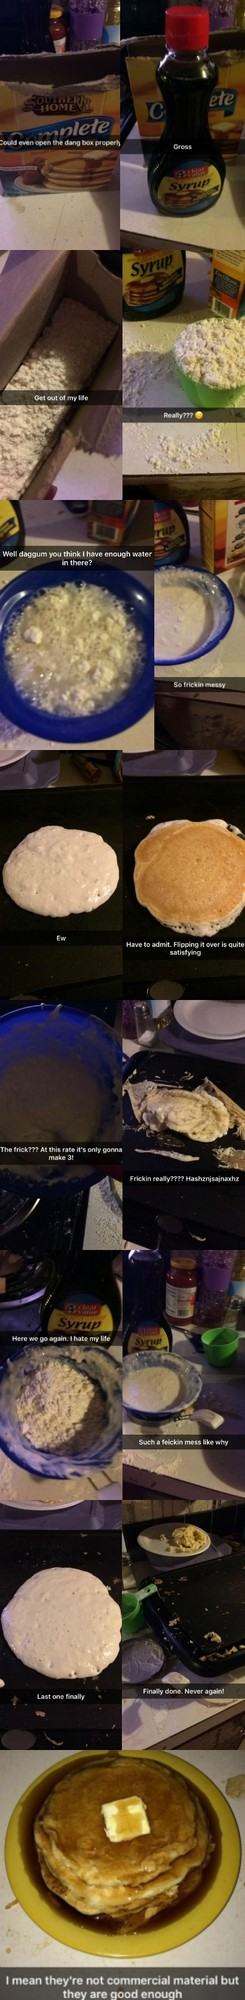 pancakejourney